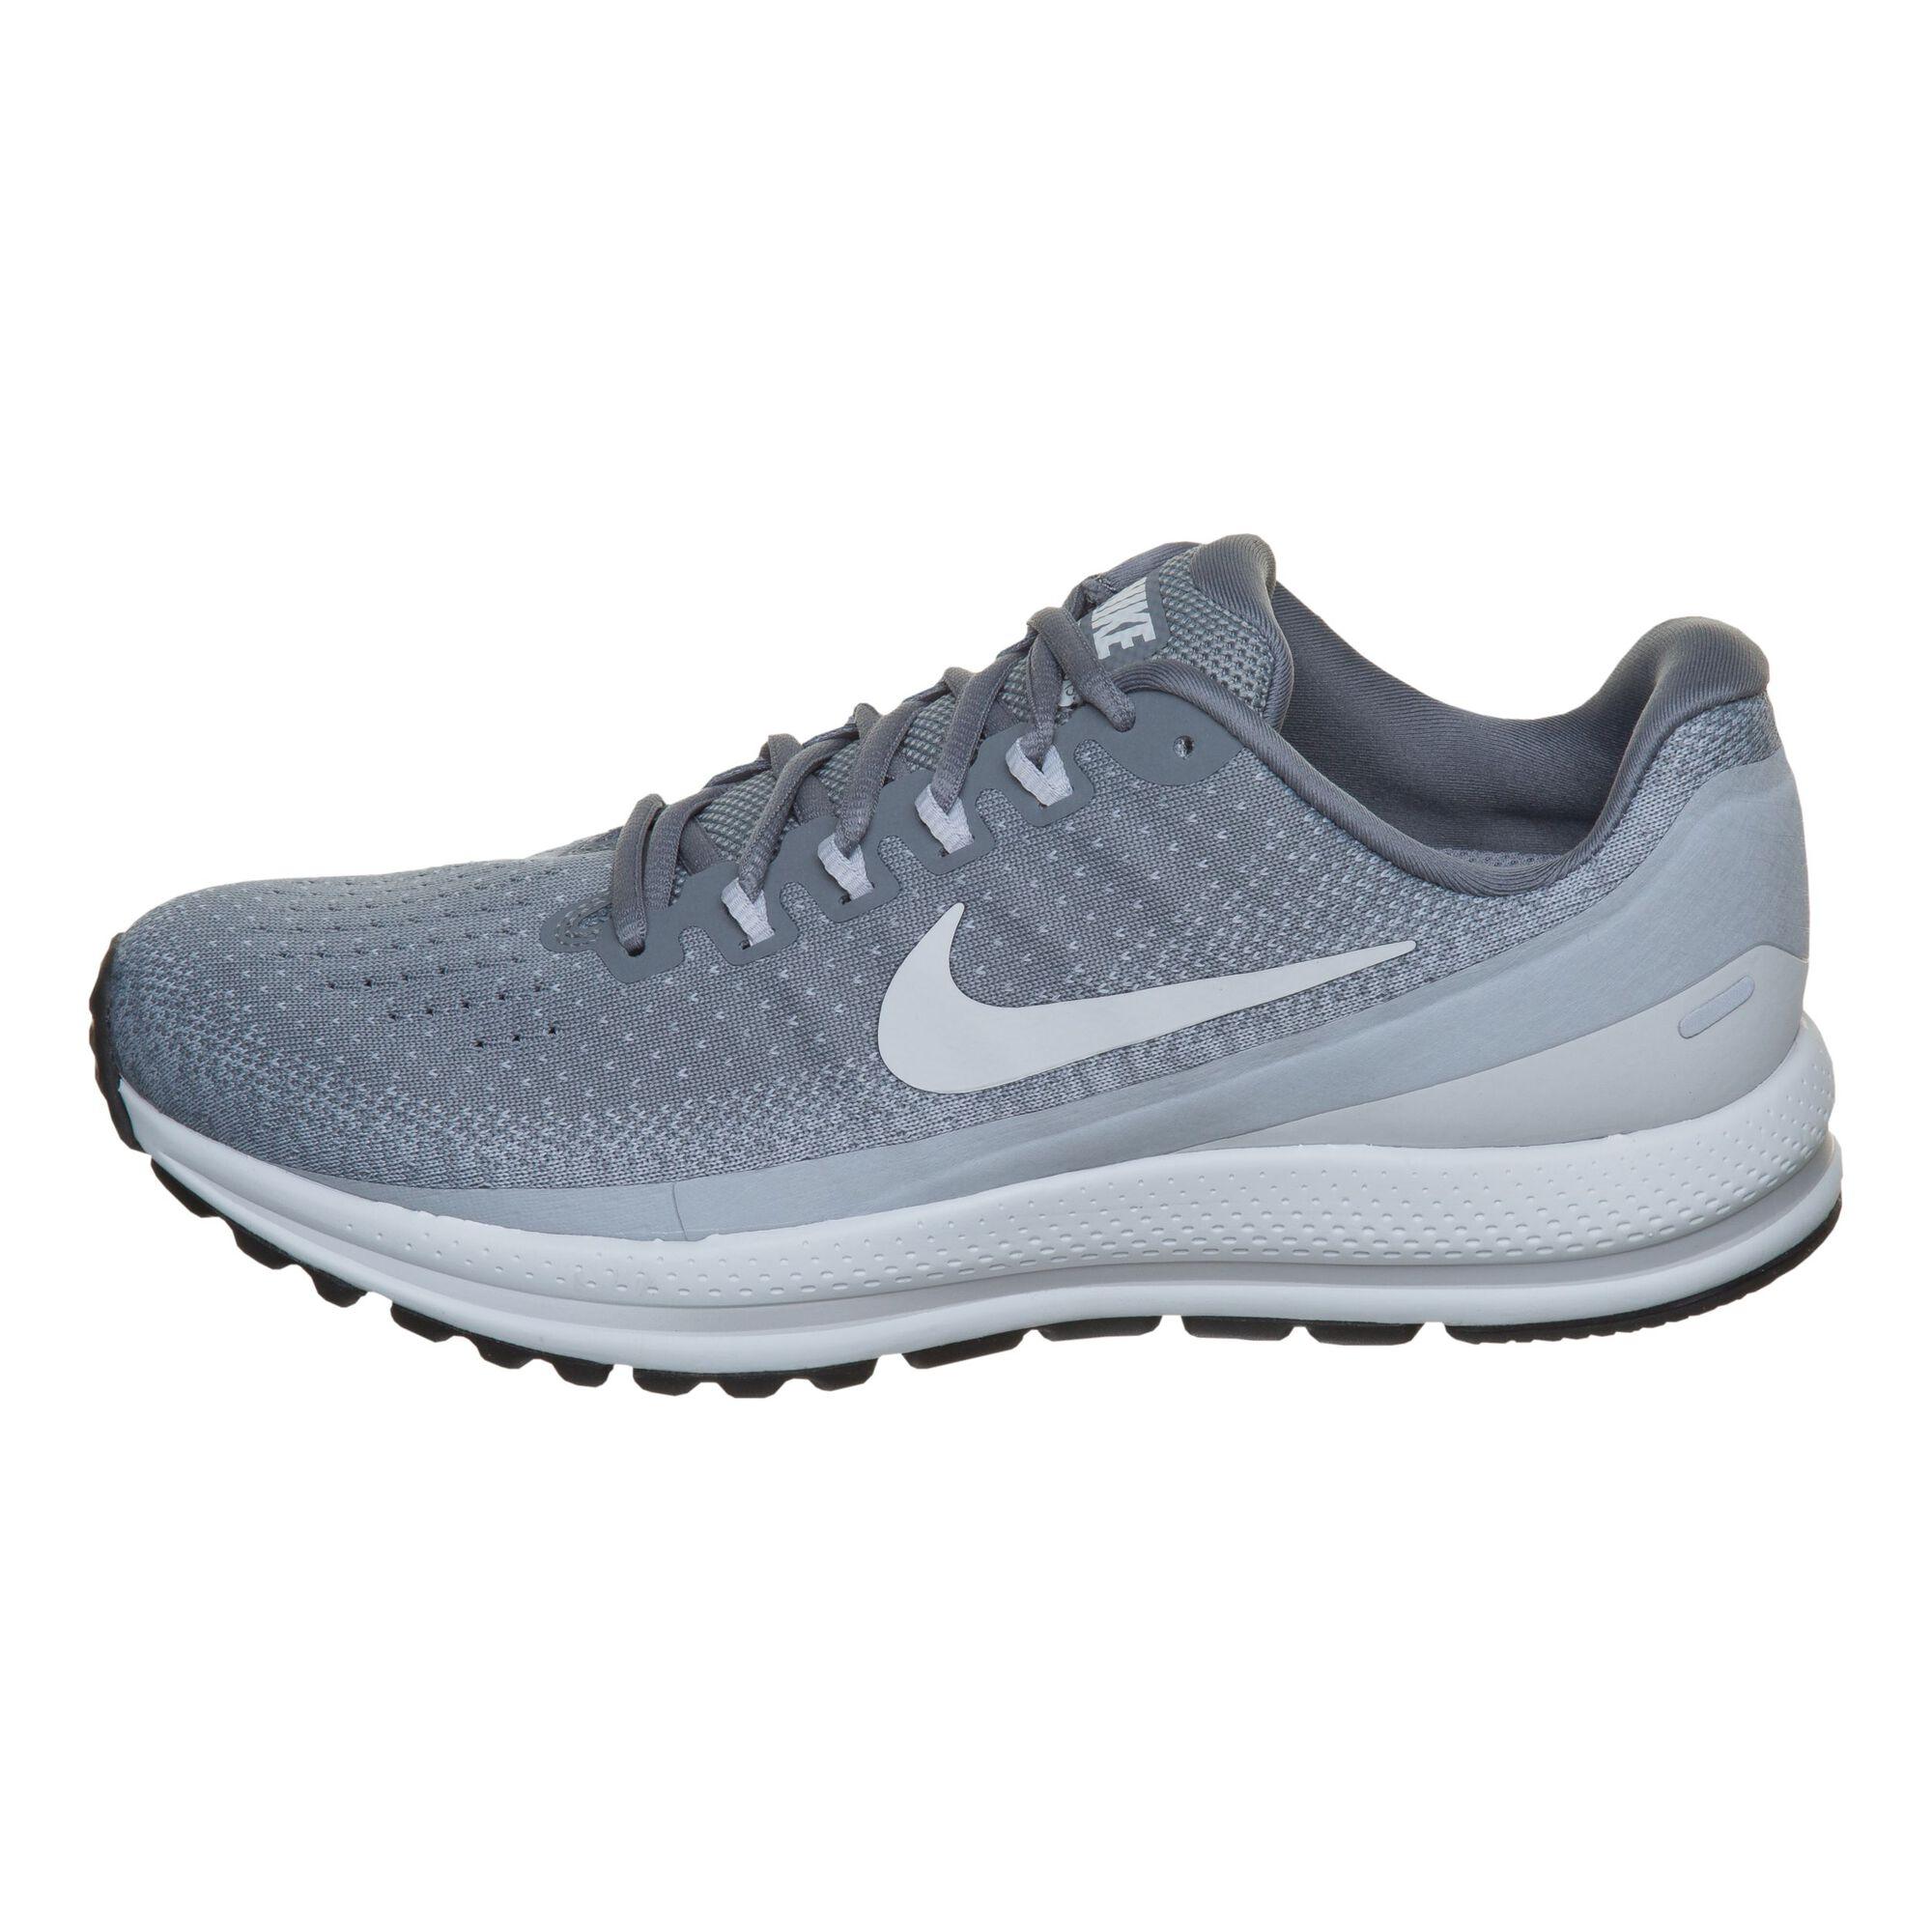 cf0b25213082f Nike · Nike · Nike · Nike · Nike · Nike · Nike · Nike · Nike · Nike. Air  Zoom Vomero 13 Men ...